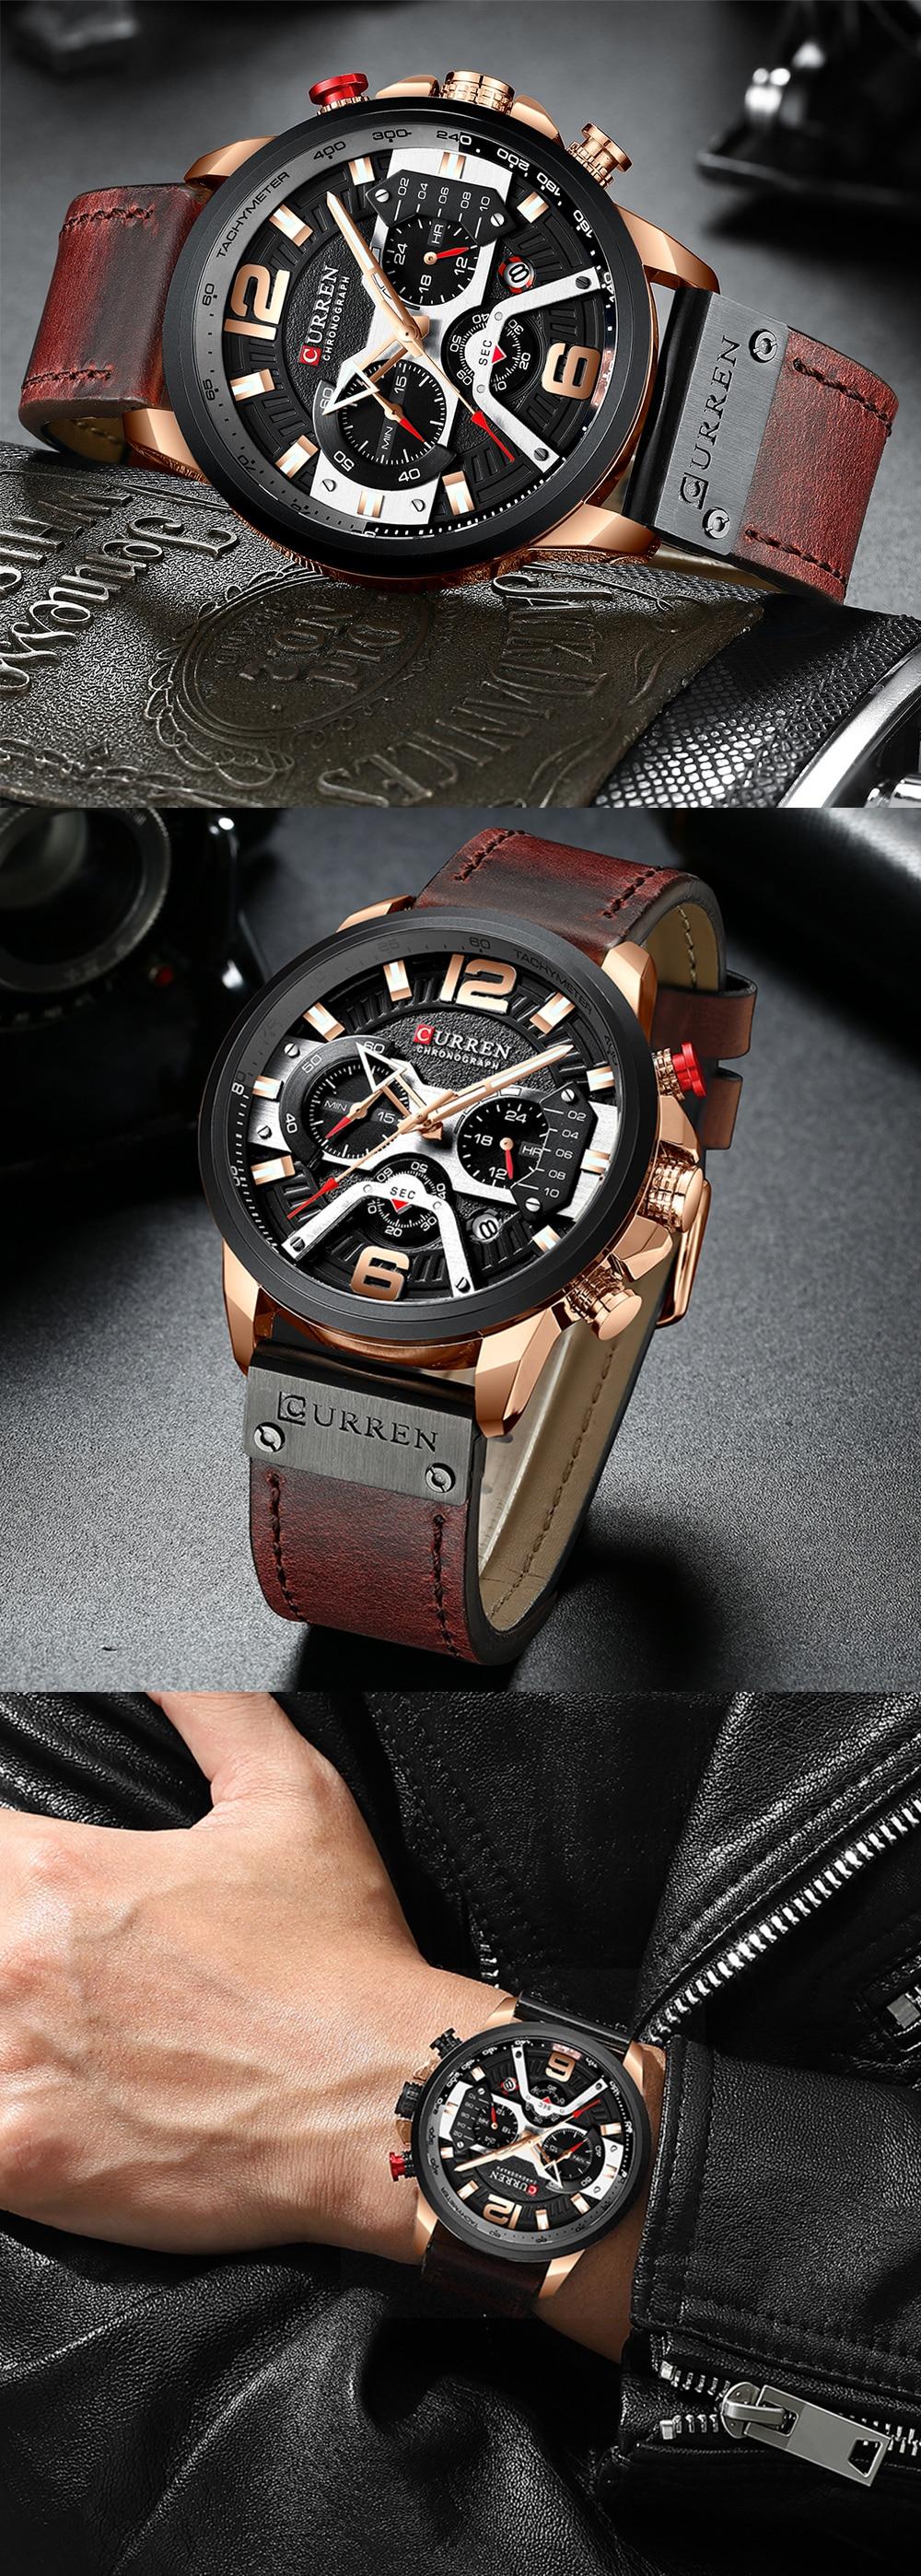 HTB1oPCiT4naK1RjSZFBq6AW7VXa4 Watches Men CURREN Brand Men Sport Watches Men's Quartz Clock Man Casual Military Waterproof Wrist Watch relogio masculino